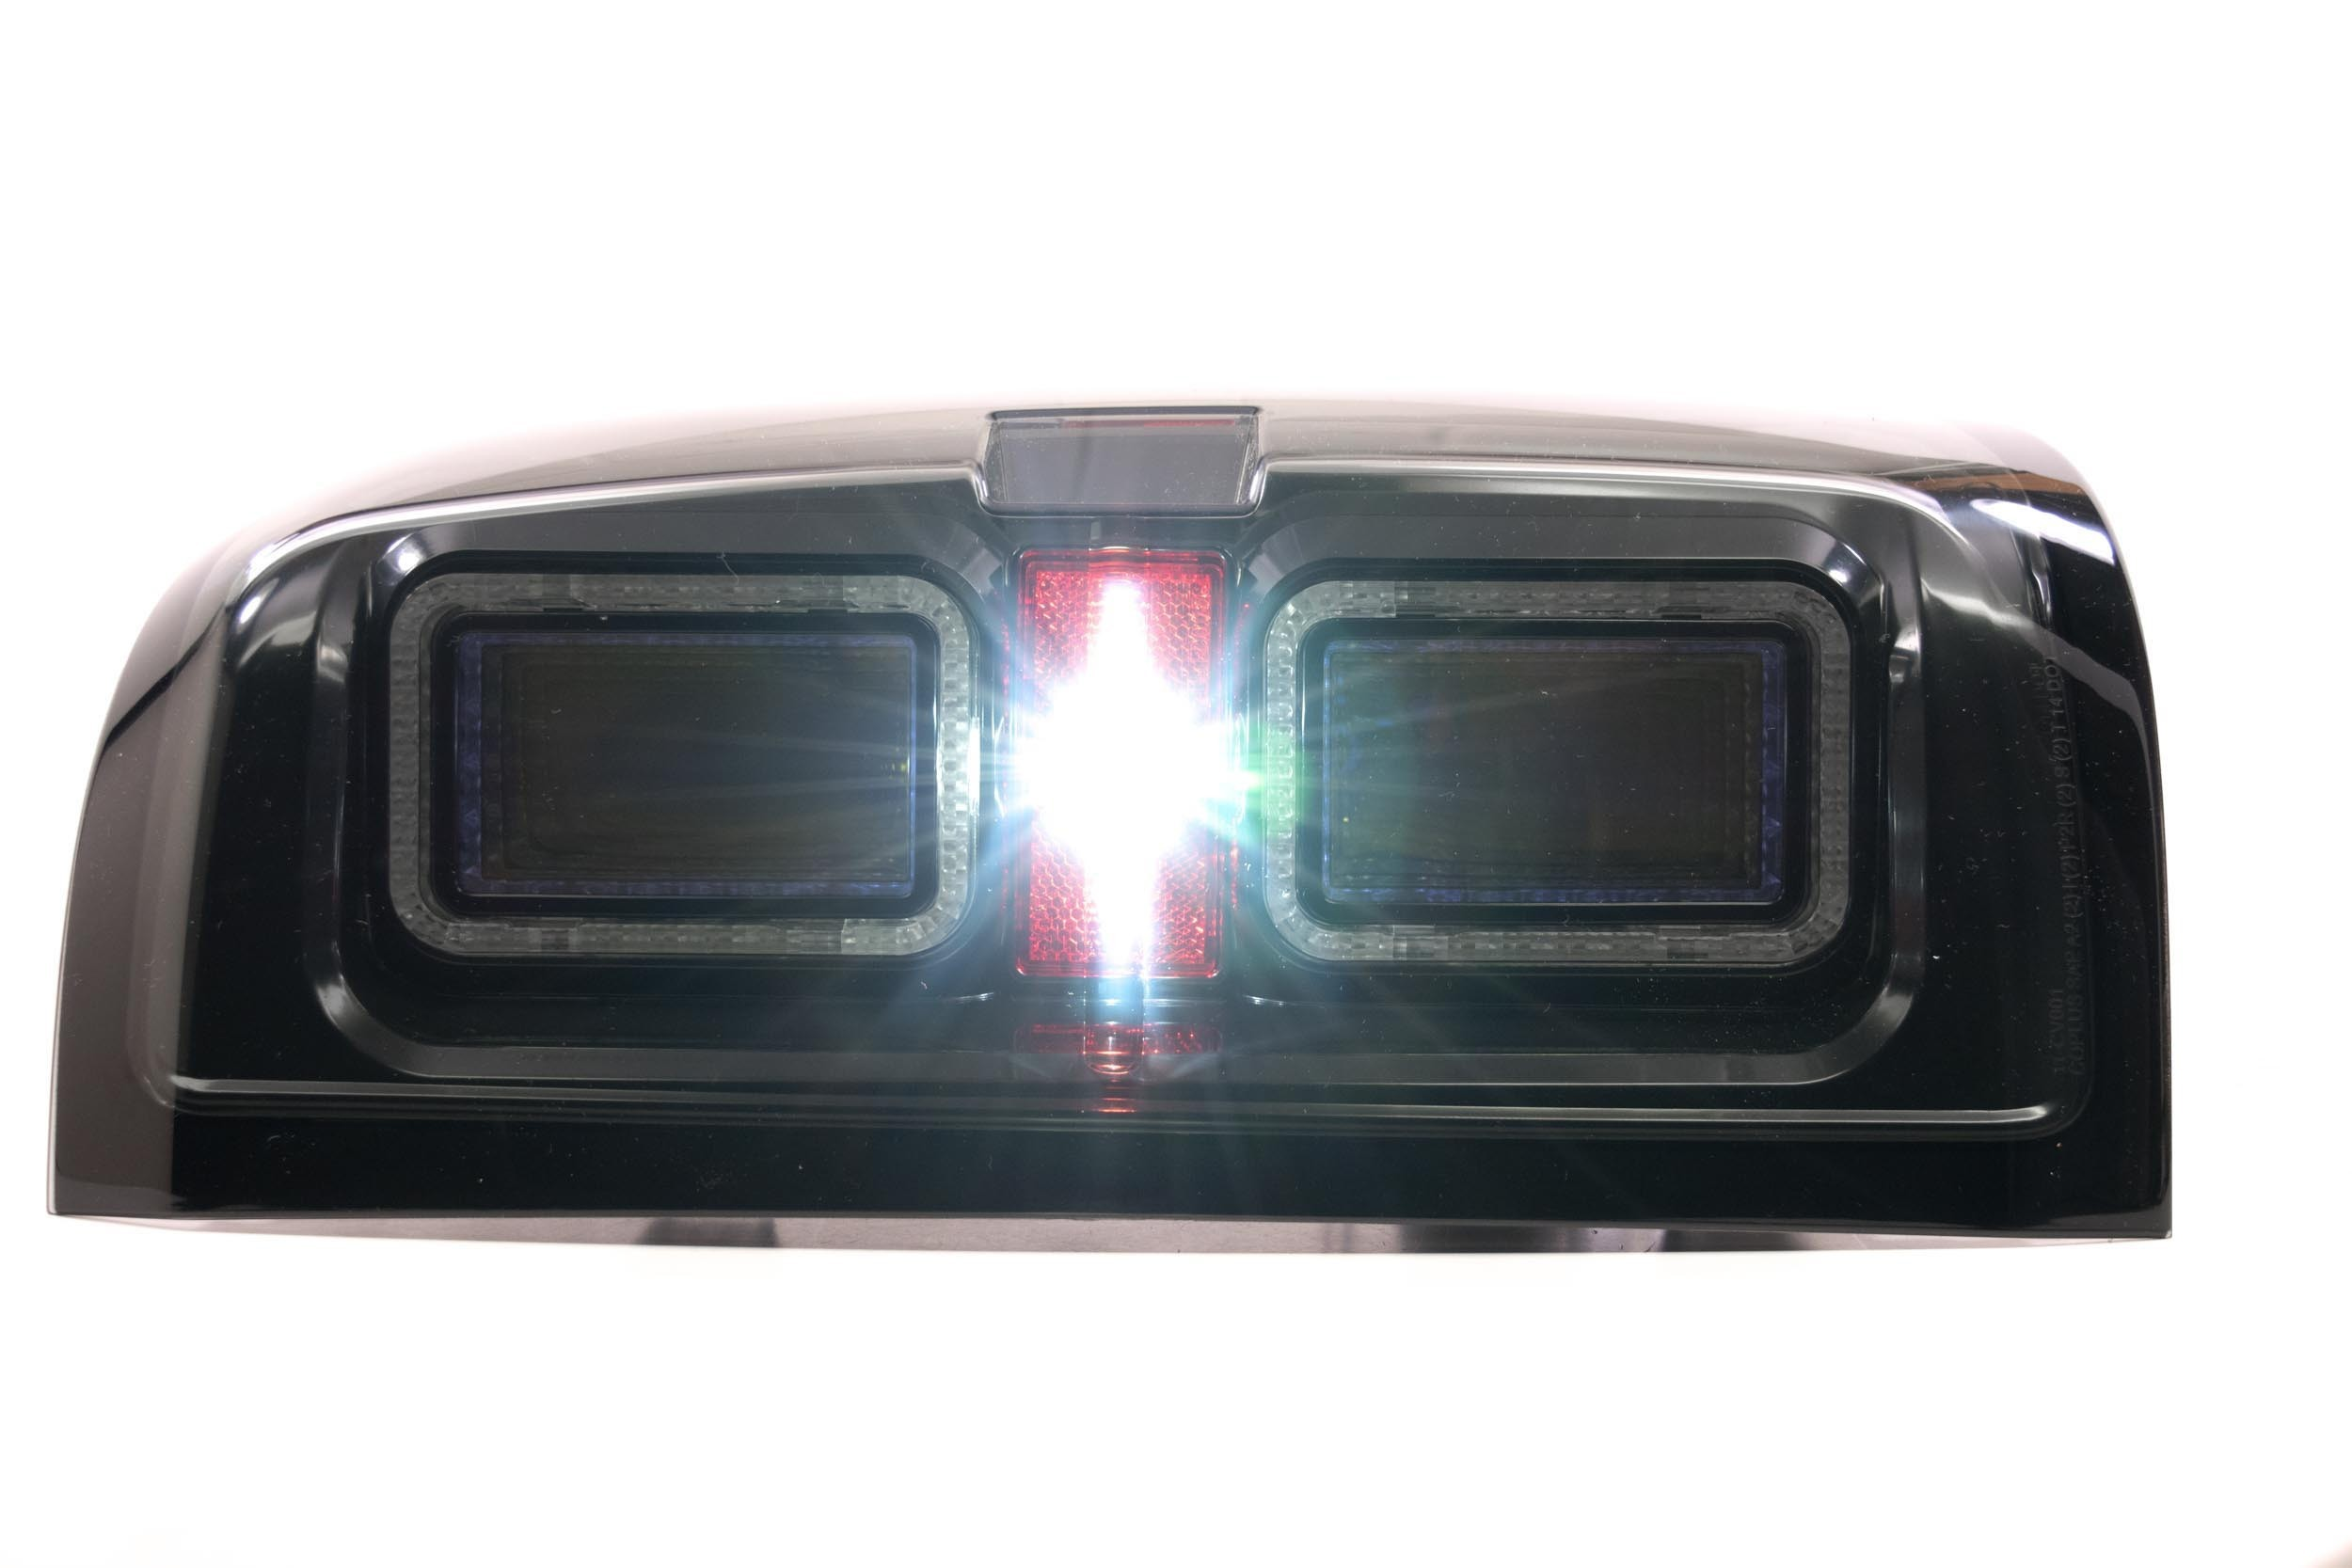 14 18 Chevrolet Silverado XB LED Tail Lights plete Housings from The Retrofit Source